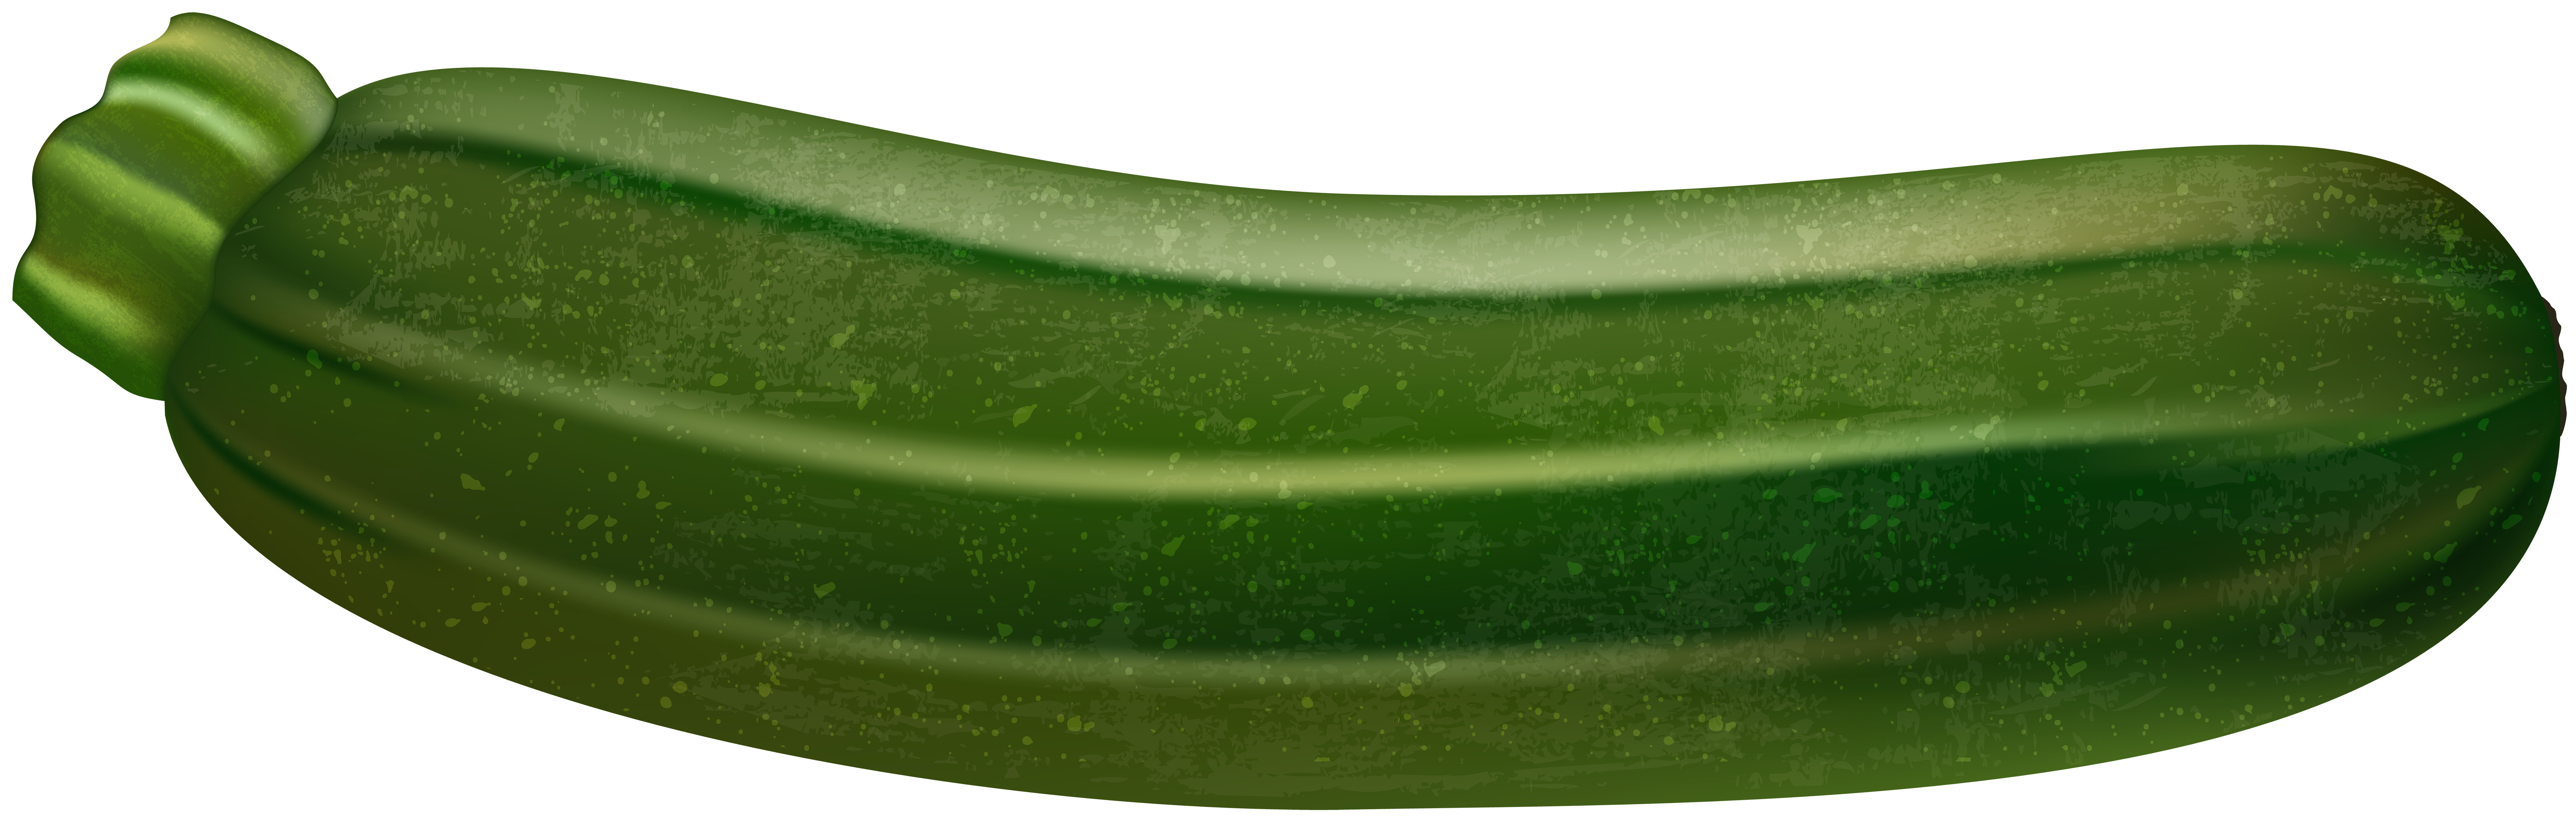 Zucchini Transparent PNG Clip Art Image.